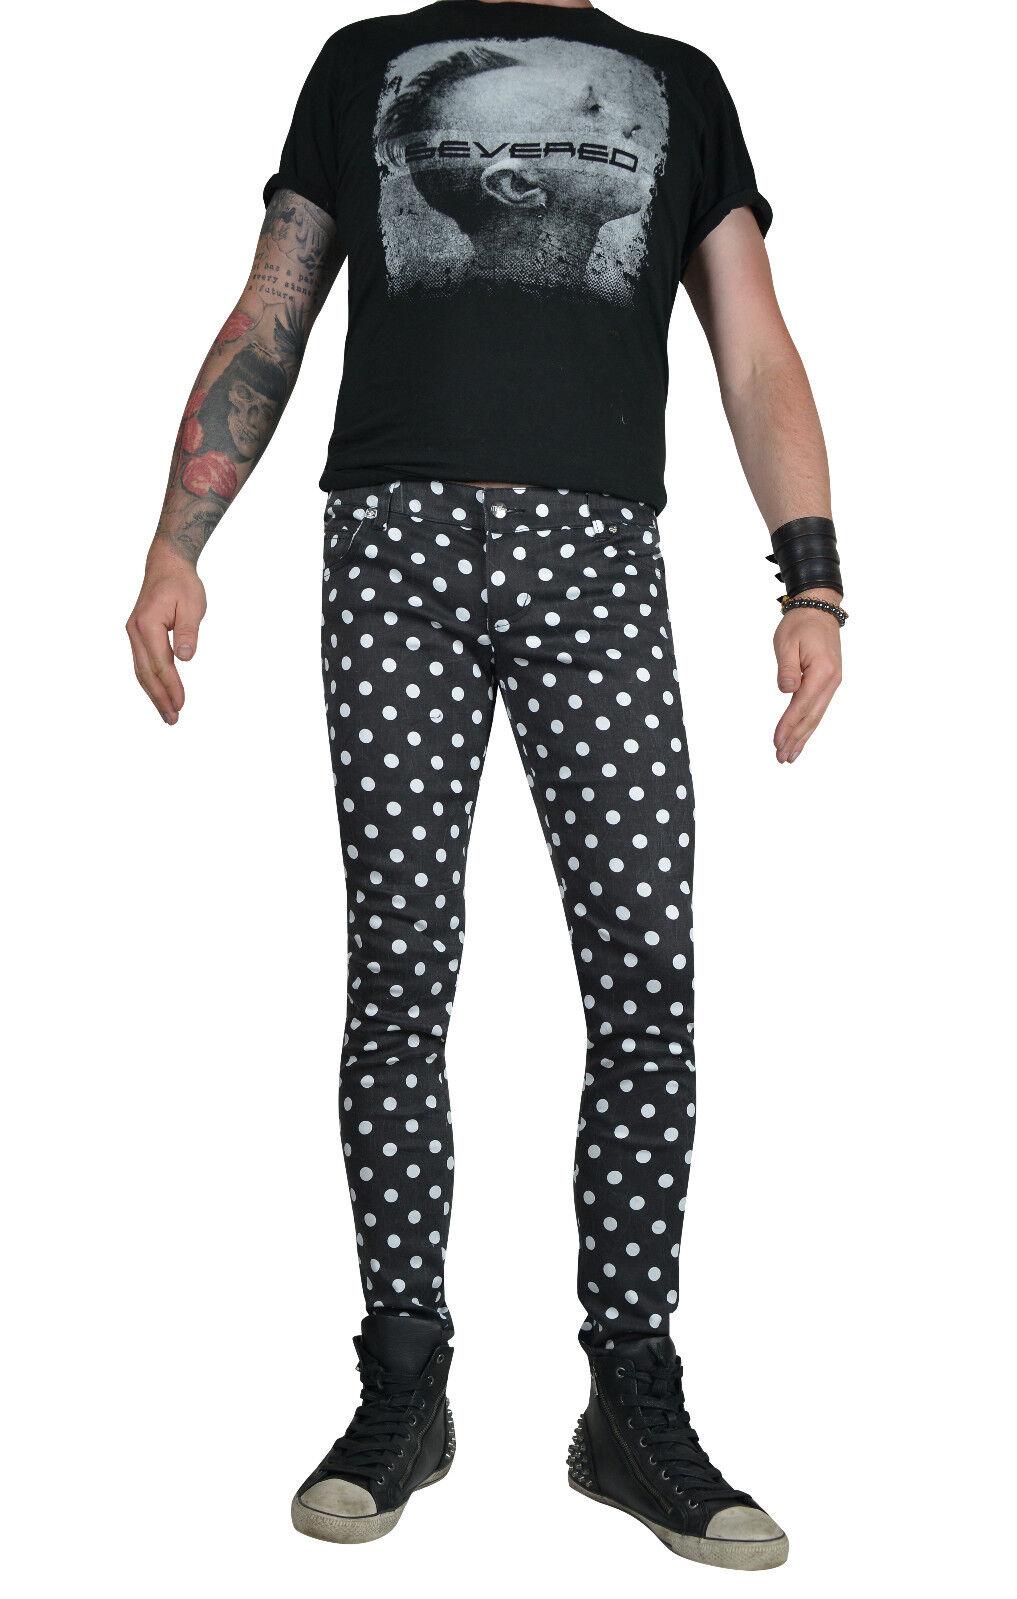 TRIPP BLACK WHITE DOTS EXPLOITED SKINNY JEANS ROCKER UNISEX FIT PUNK ROCK PANTS Clothing, Shoes & Accessories